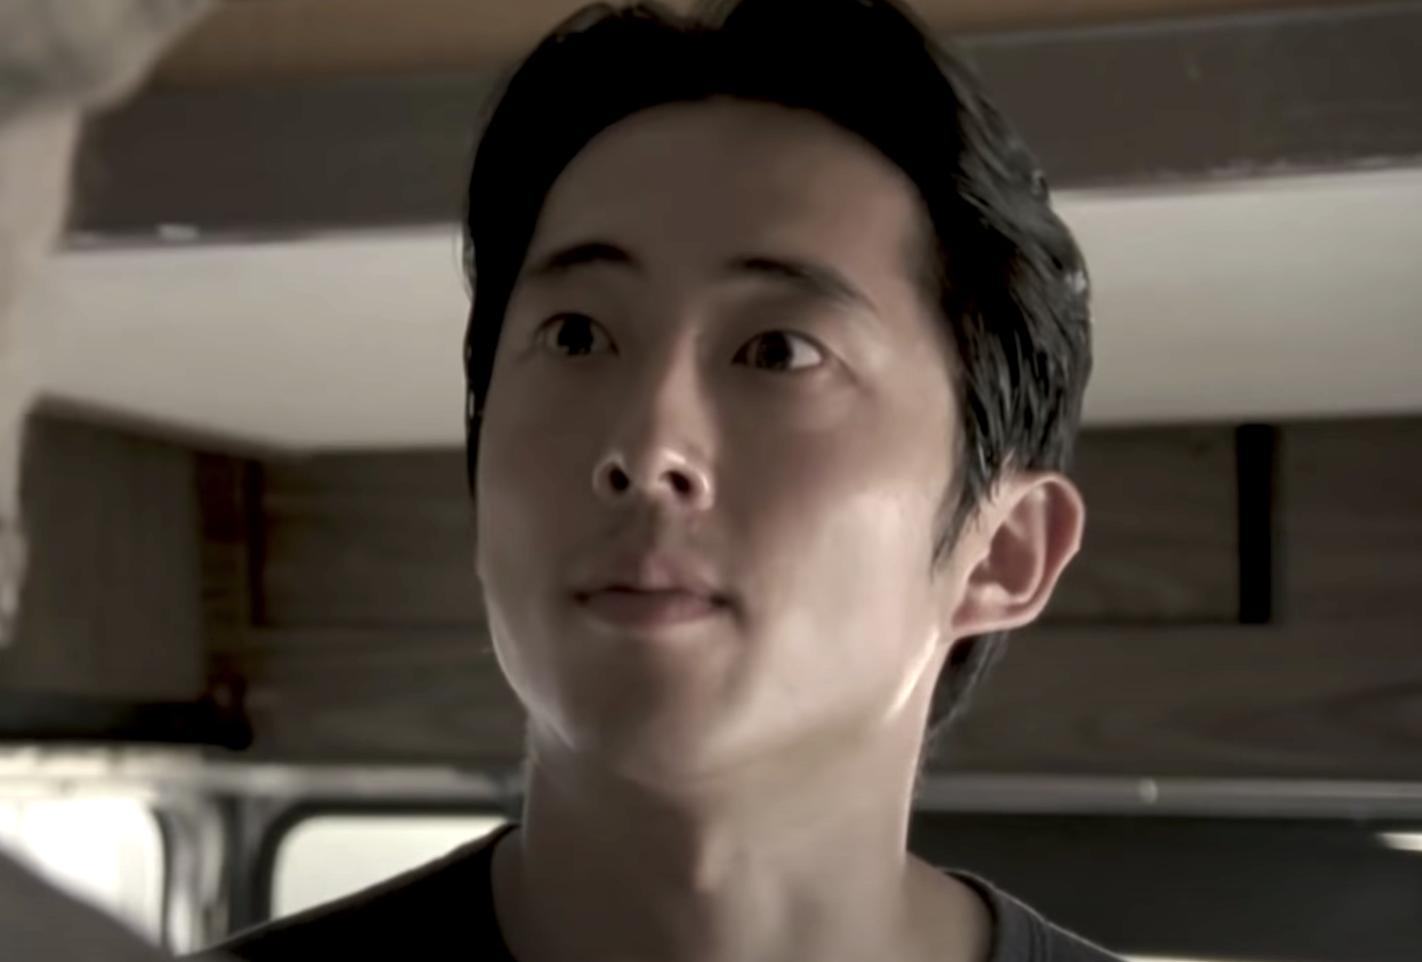 Glenn with wide eyes